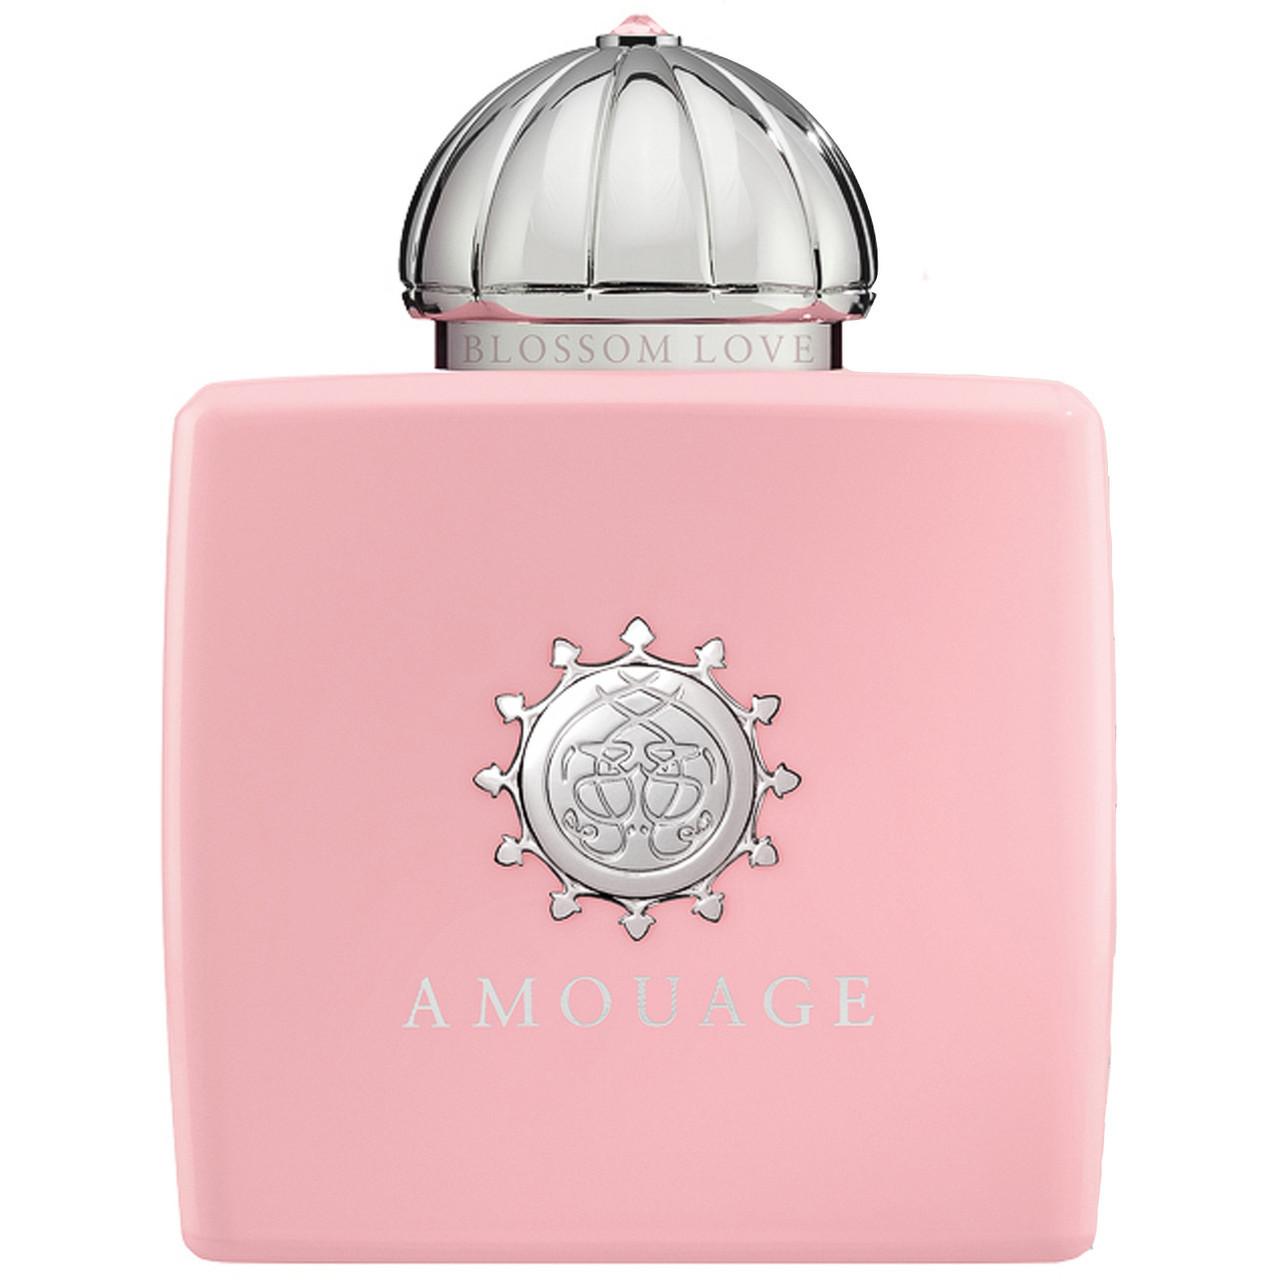 Amouage Blossom Love парфюмированная вода 100 ml. (Тестер Амуаж Блоссум Лав)